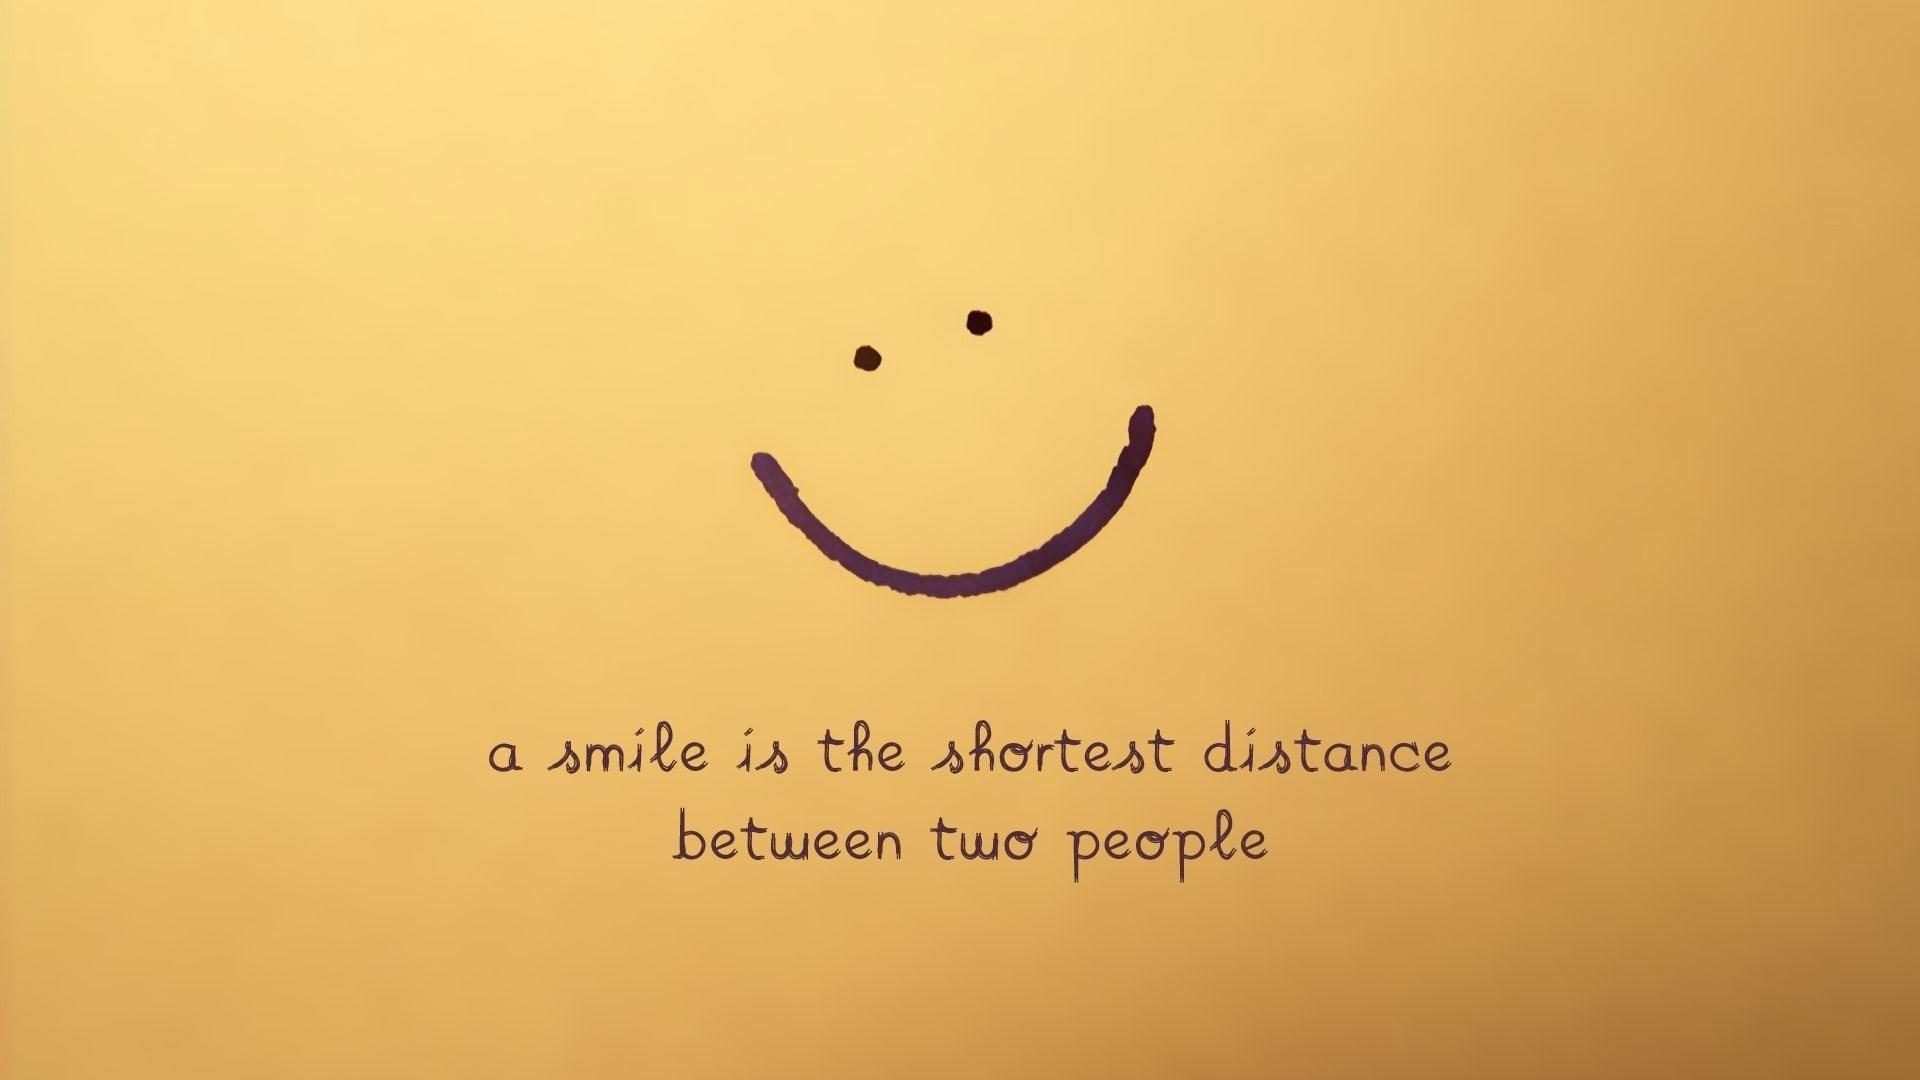 smile-design-quote-1920x1080